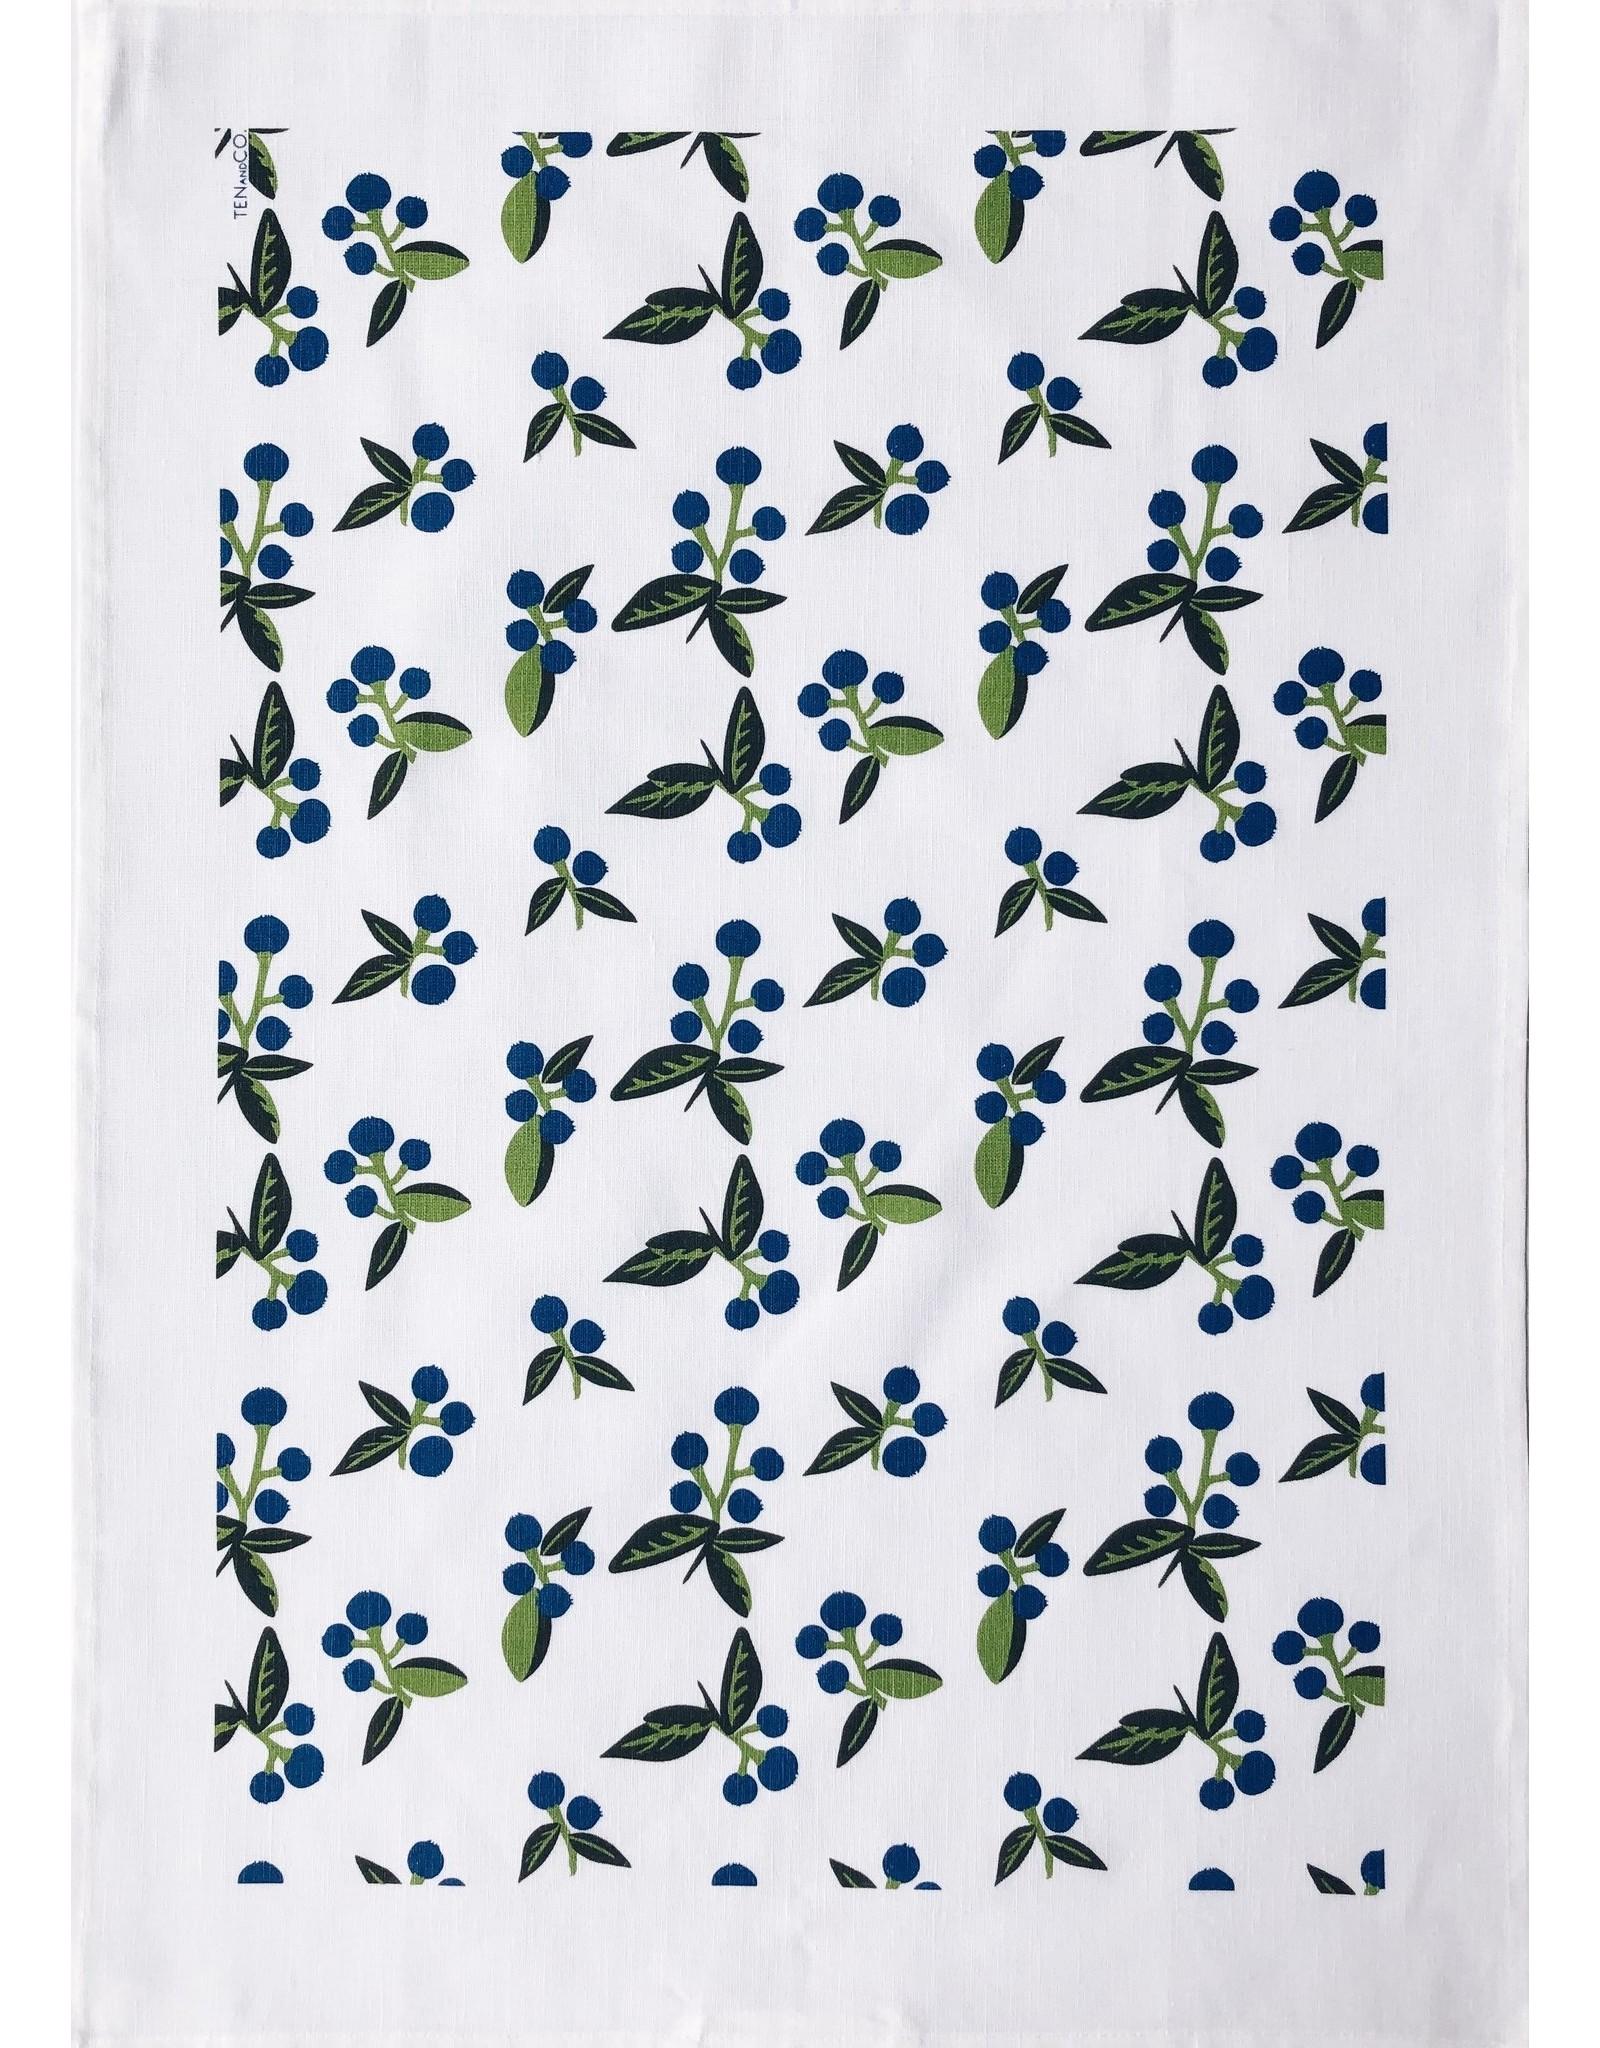 Ten & Co Tea Towel Wild Blueberry